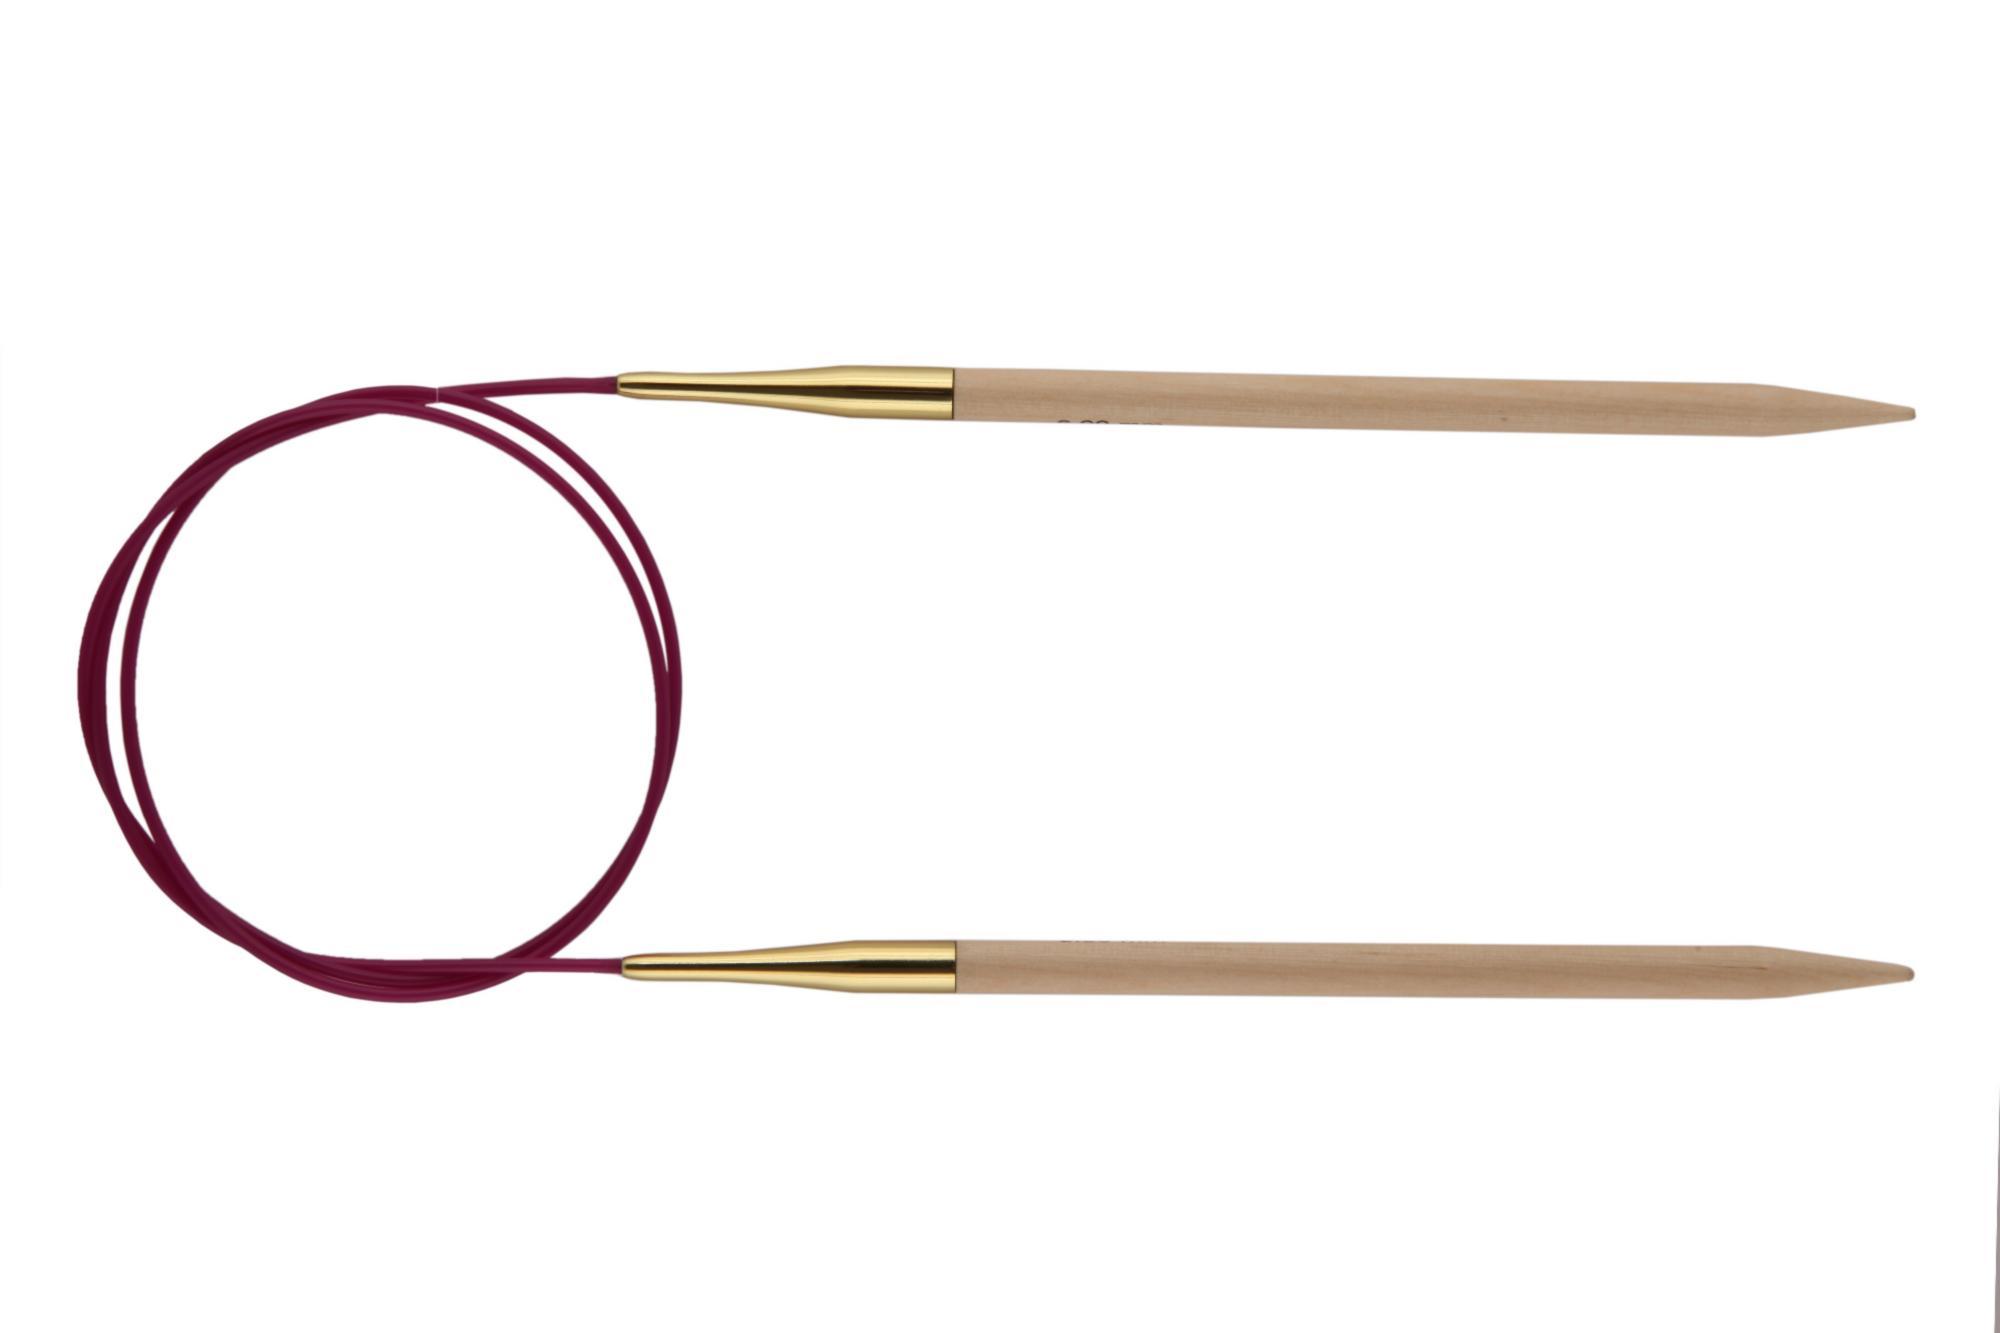 Спицы круговые 40 см Basix Birch Wood KnitPro, 35314, 7.00 мм